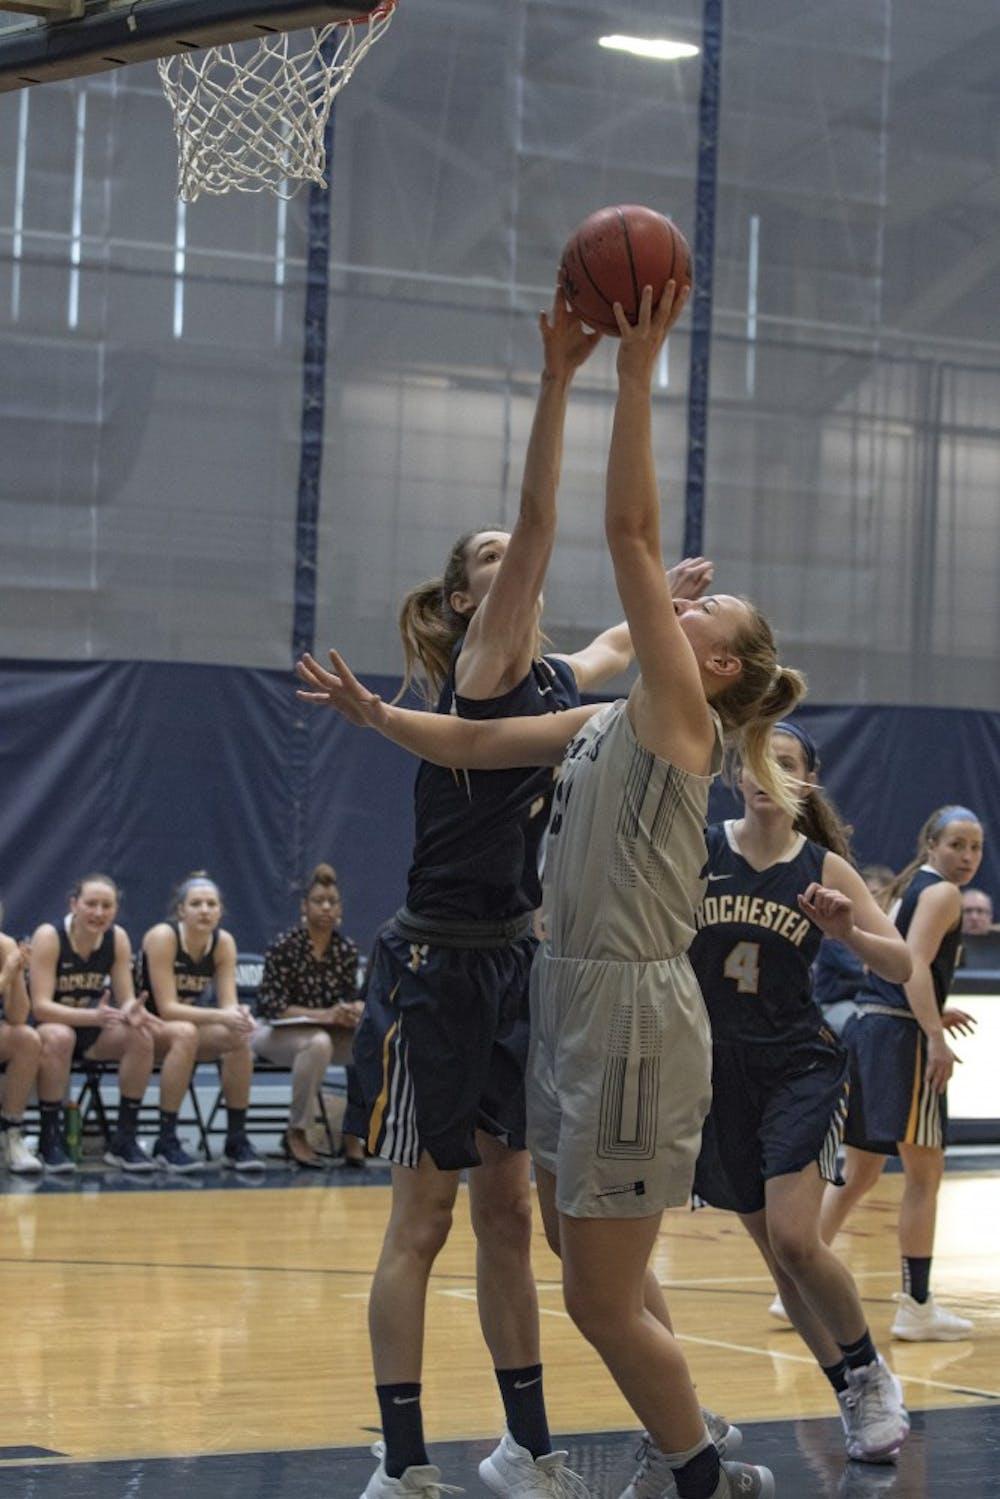 basketball-m-w-v-rochester-2-3-19-zb-0461